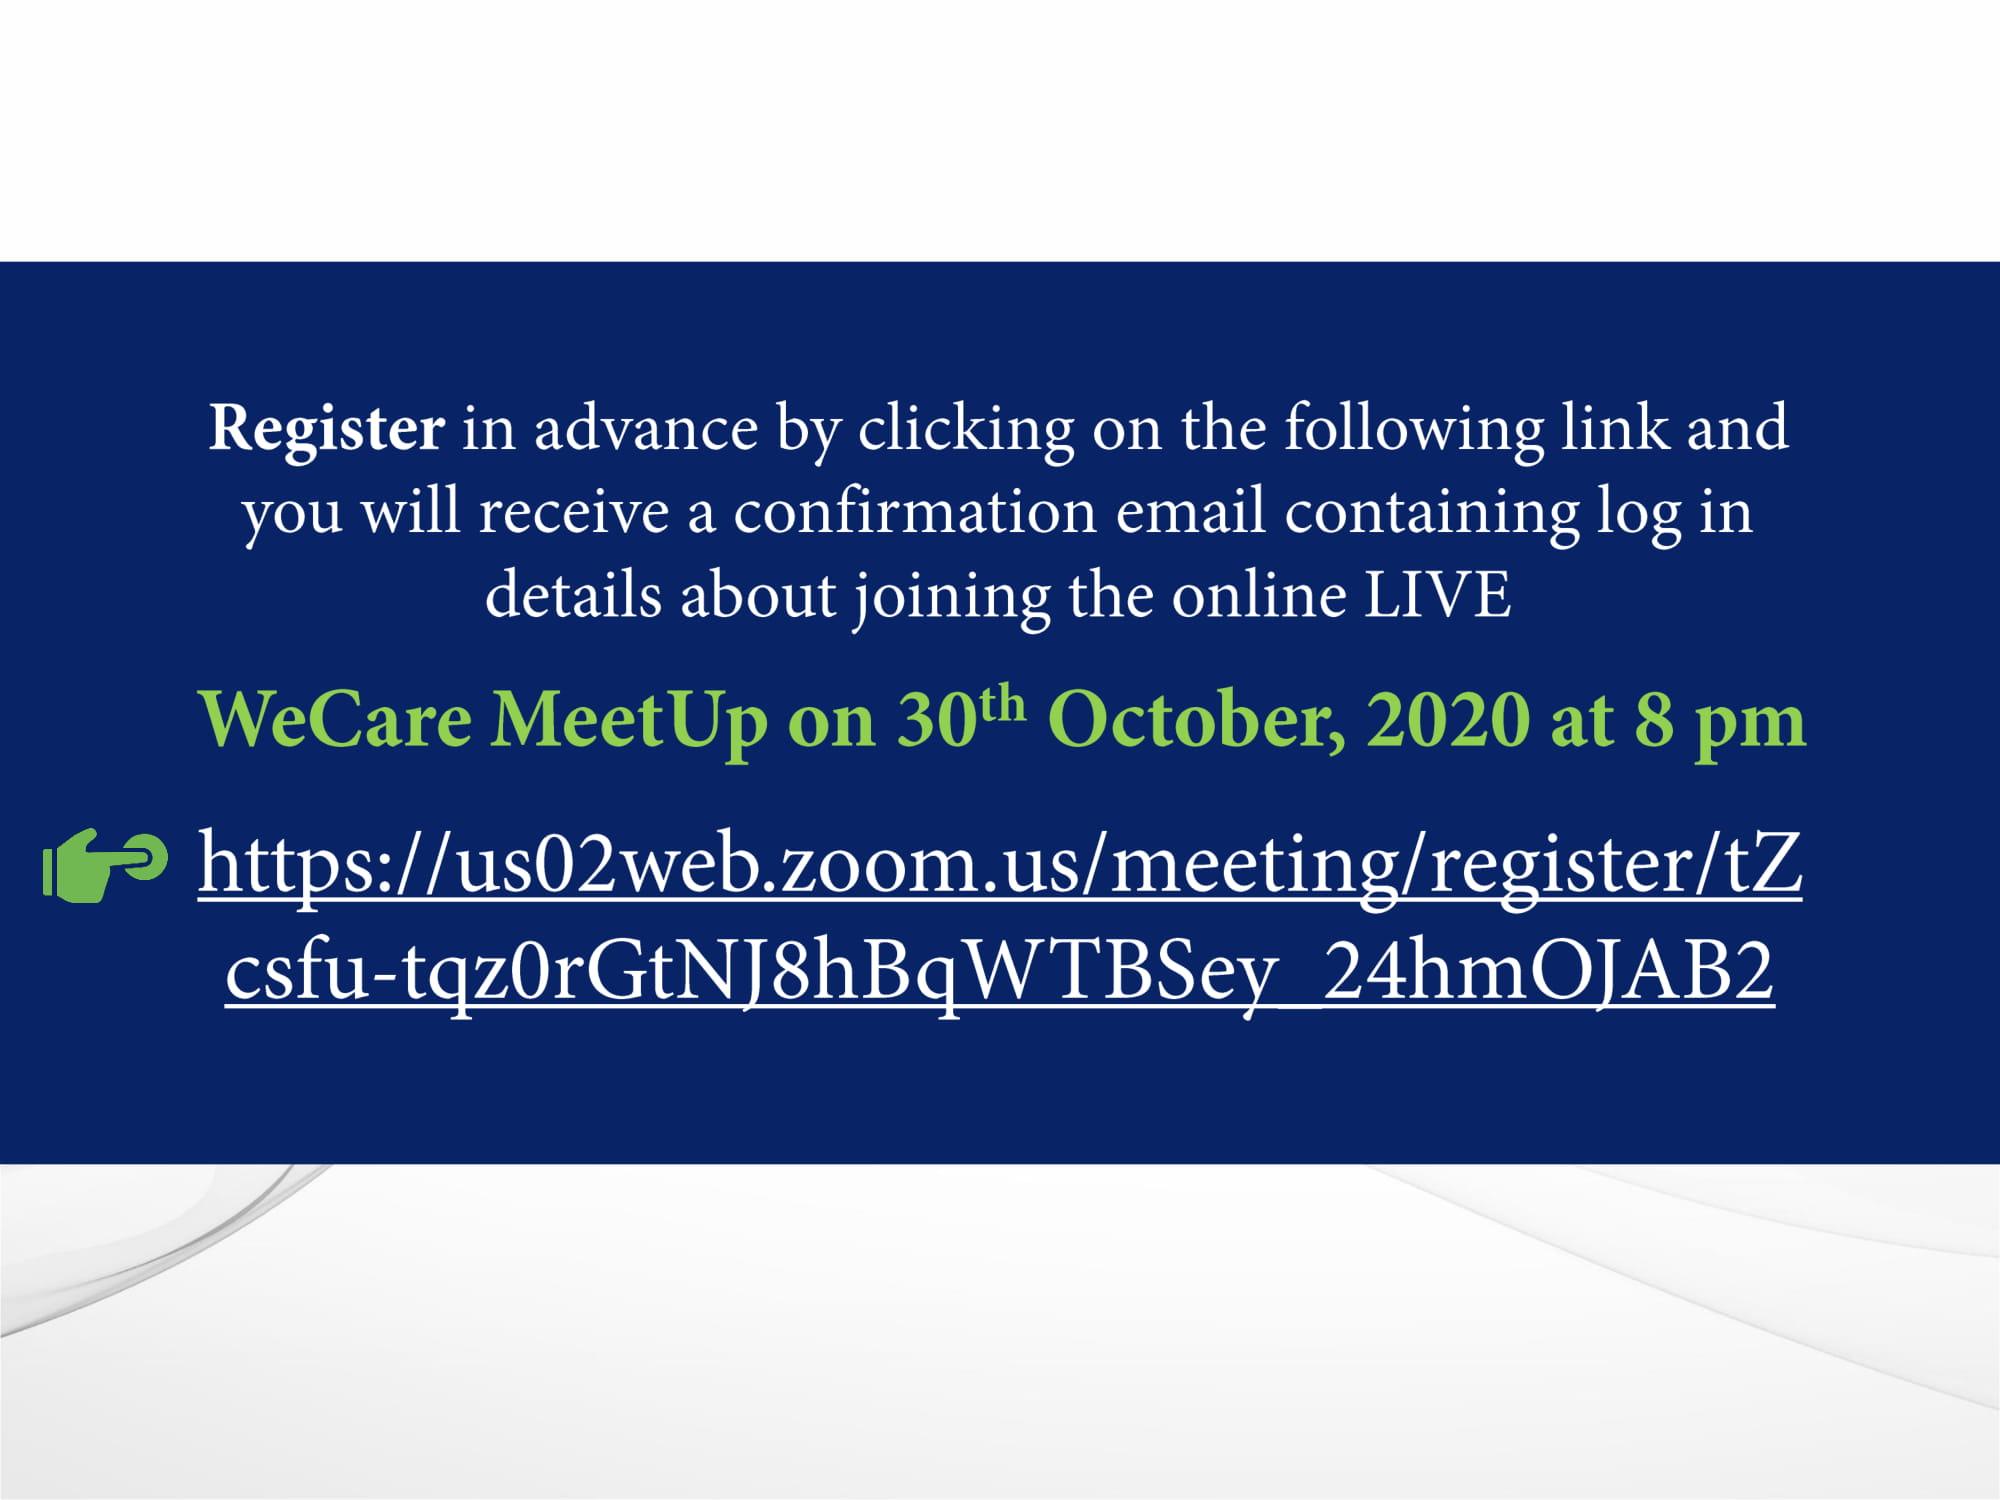 Invitation - WeCare MeetUp - 30th October, 2020-2